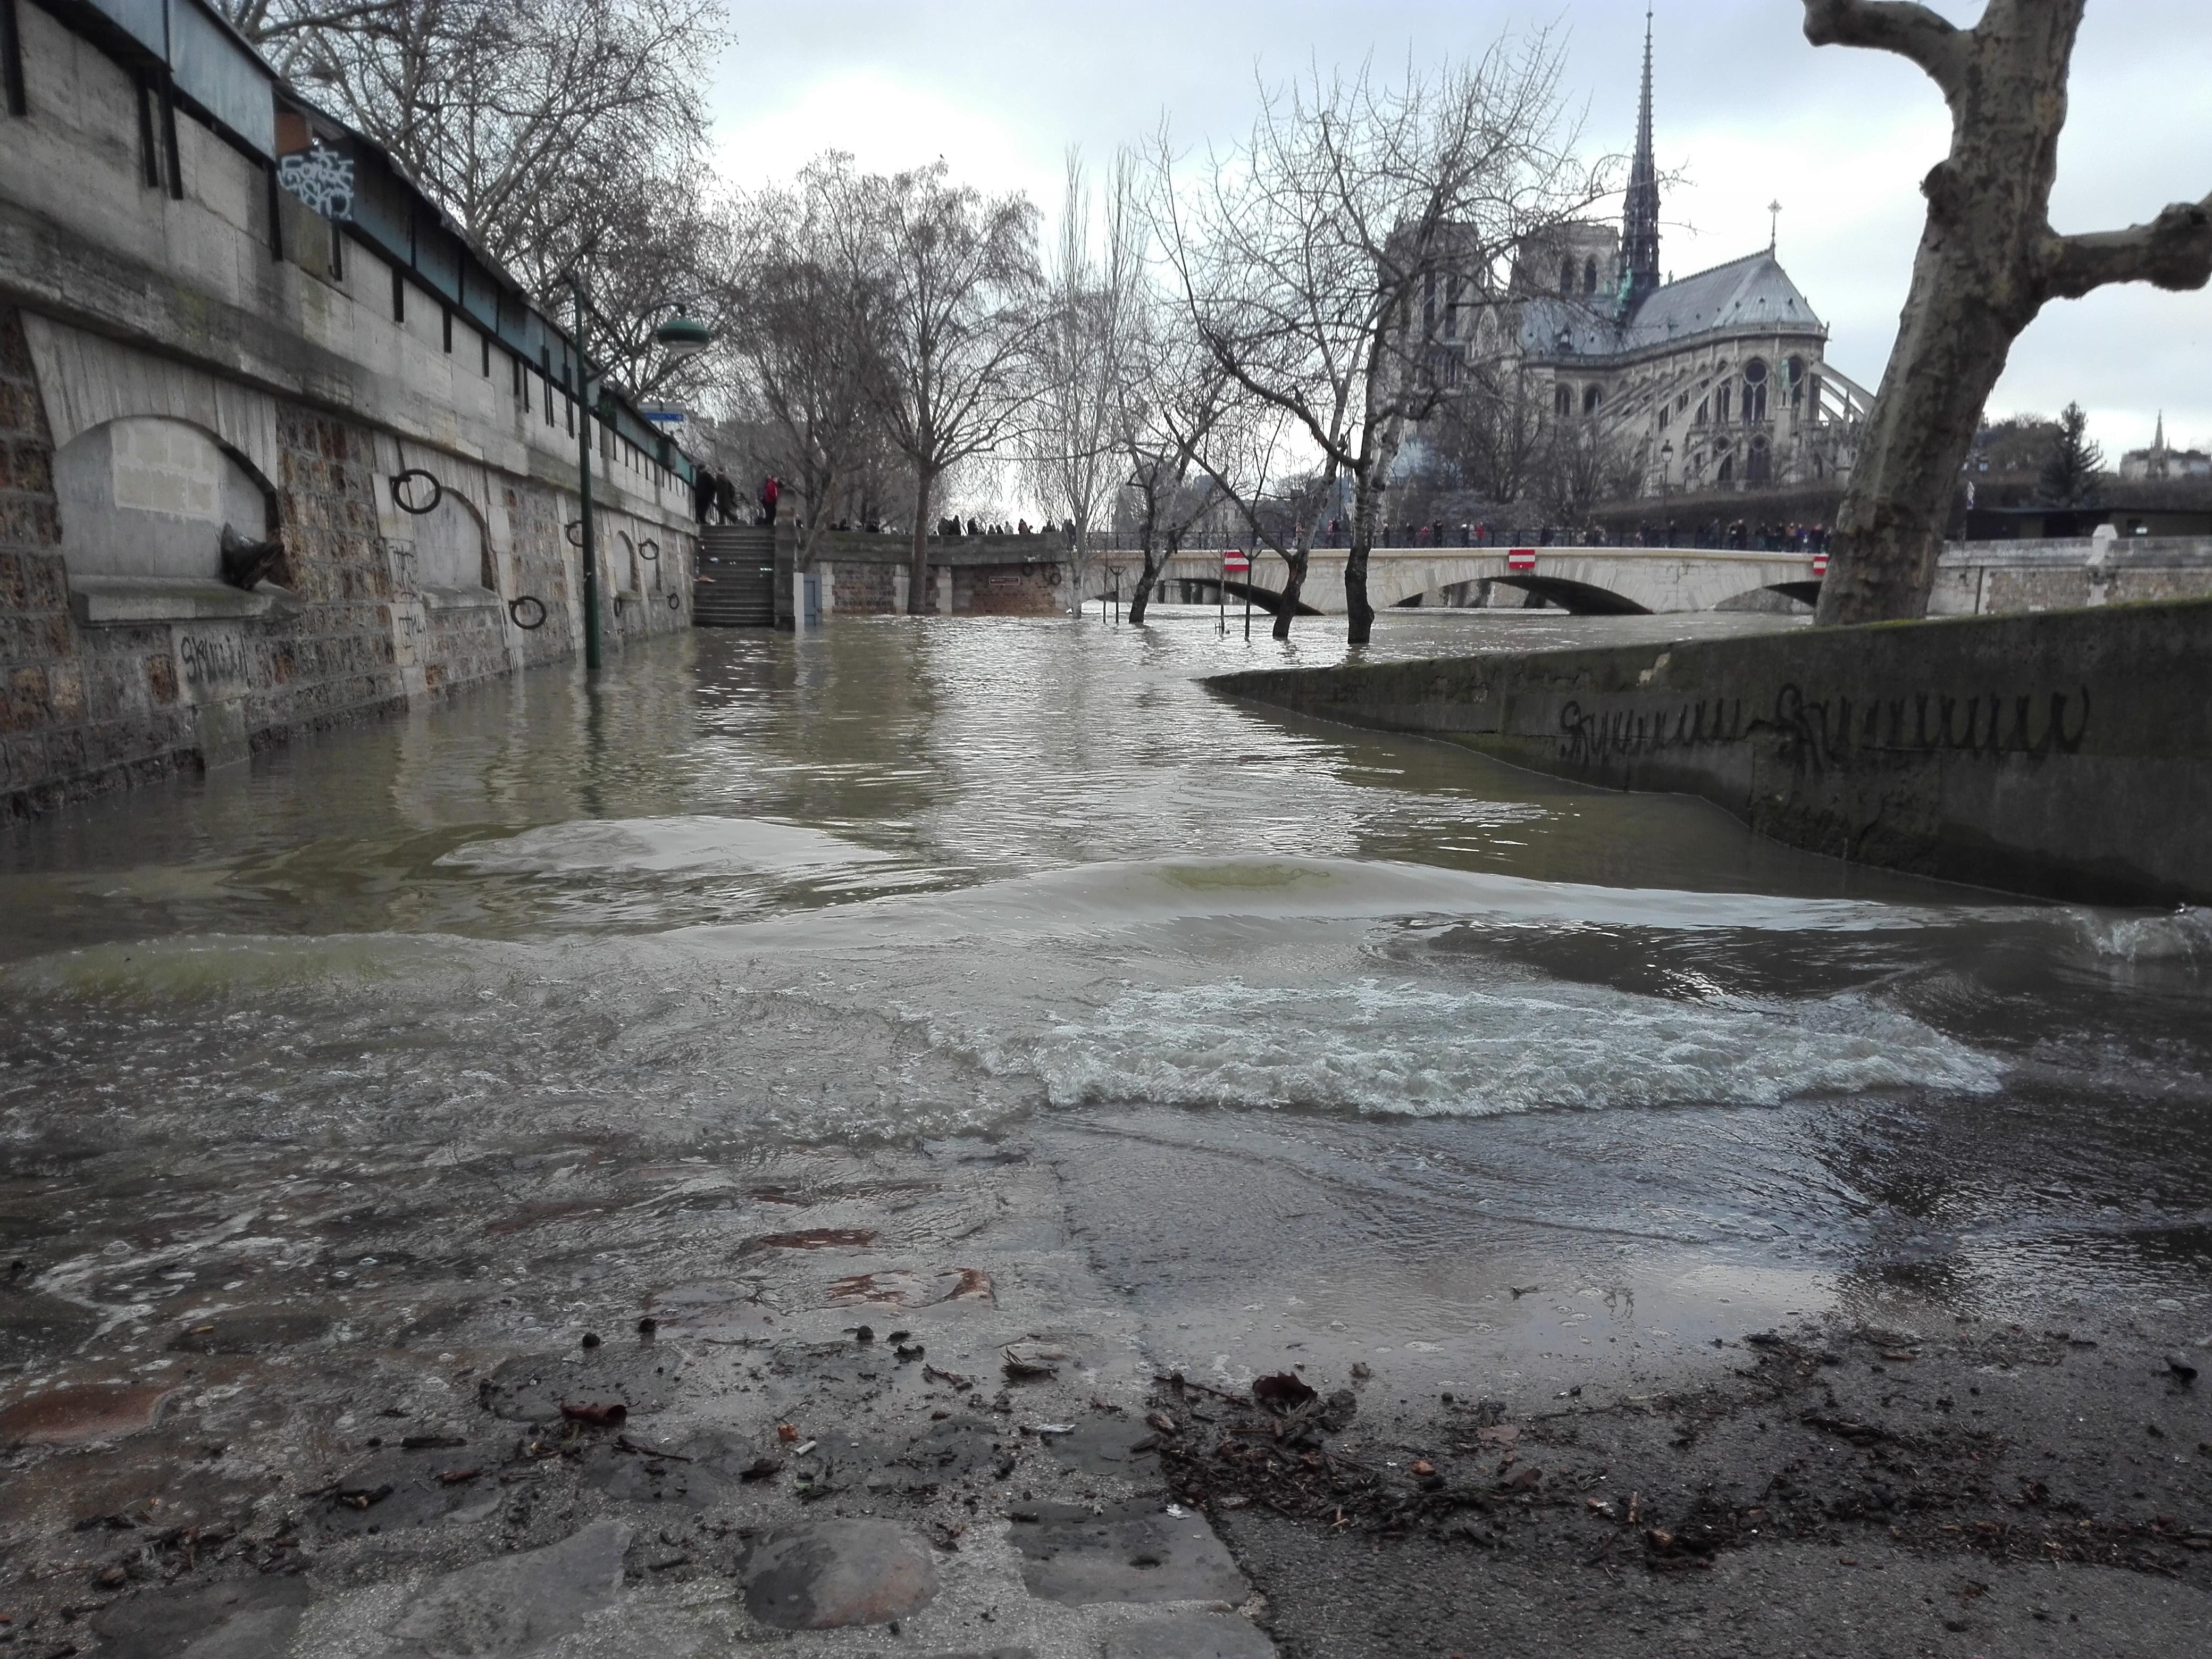 crue de la Seine, Paris 01 2018